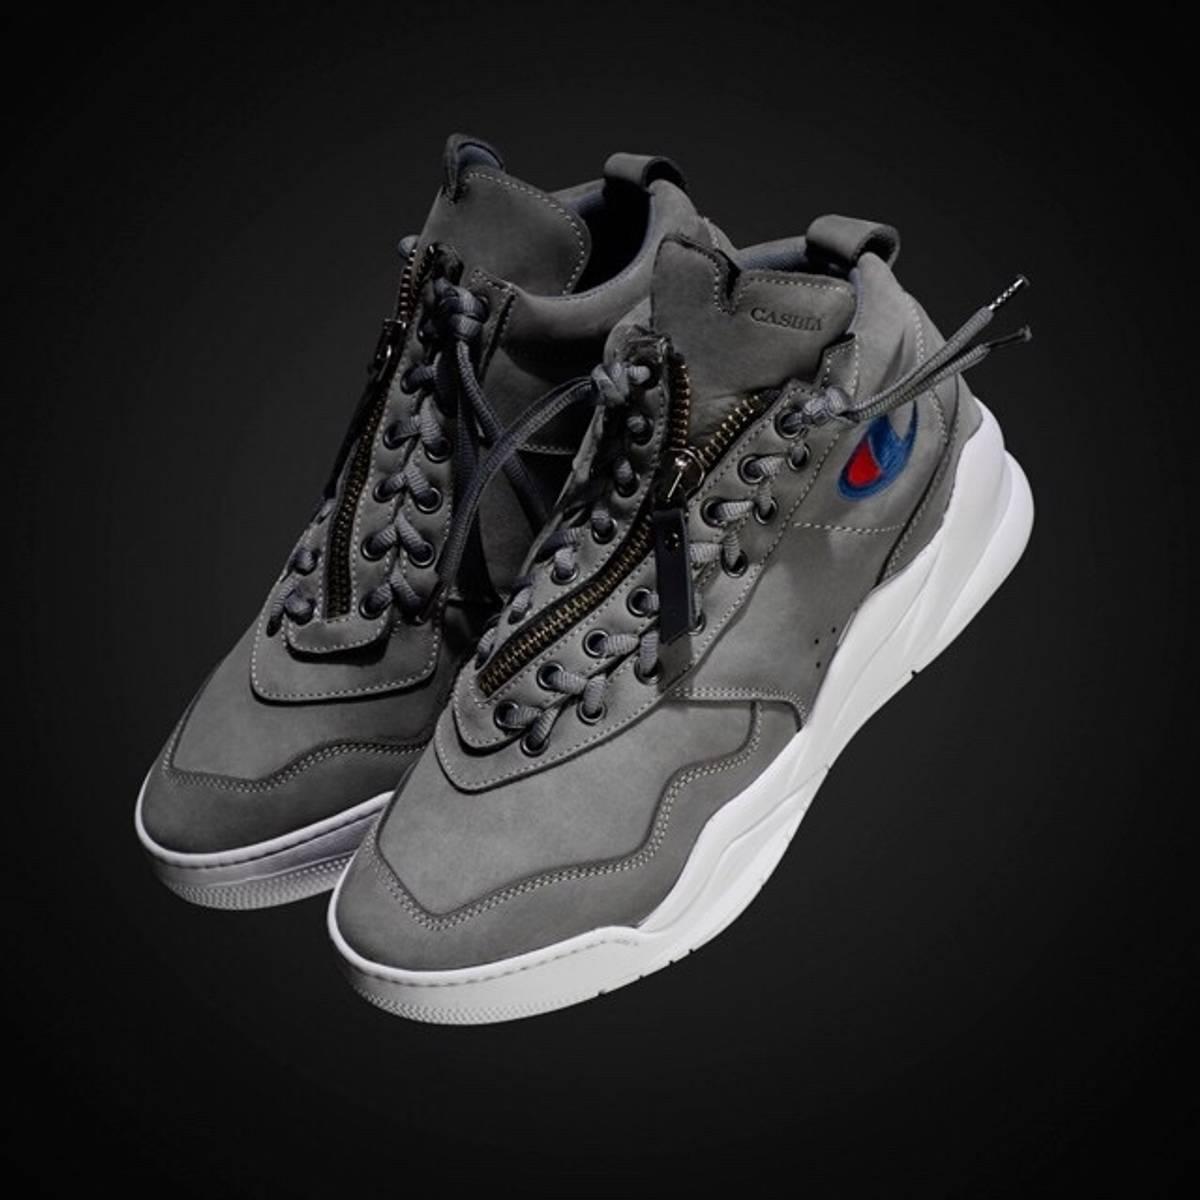 baf9310d614c23 Champion Casbia x Champion AWOL Atlanta Grey Size 12 - Hi-Top Sneakers for  Sale - Grailed